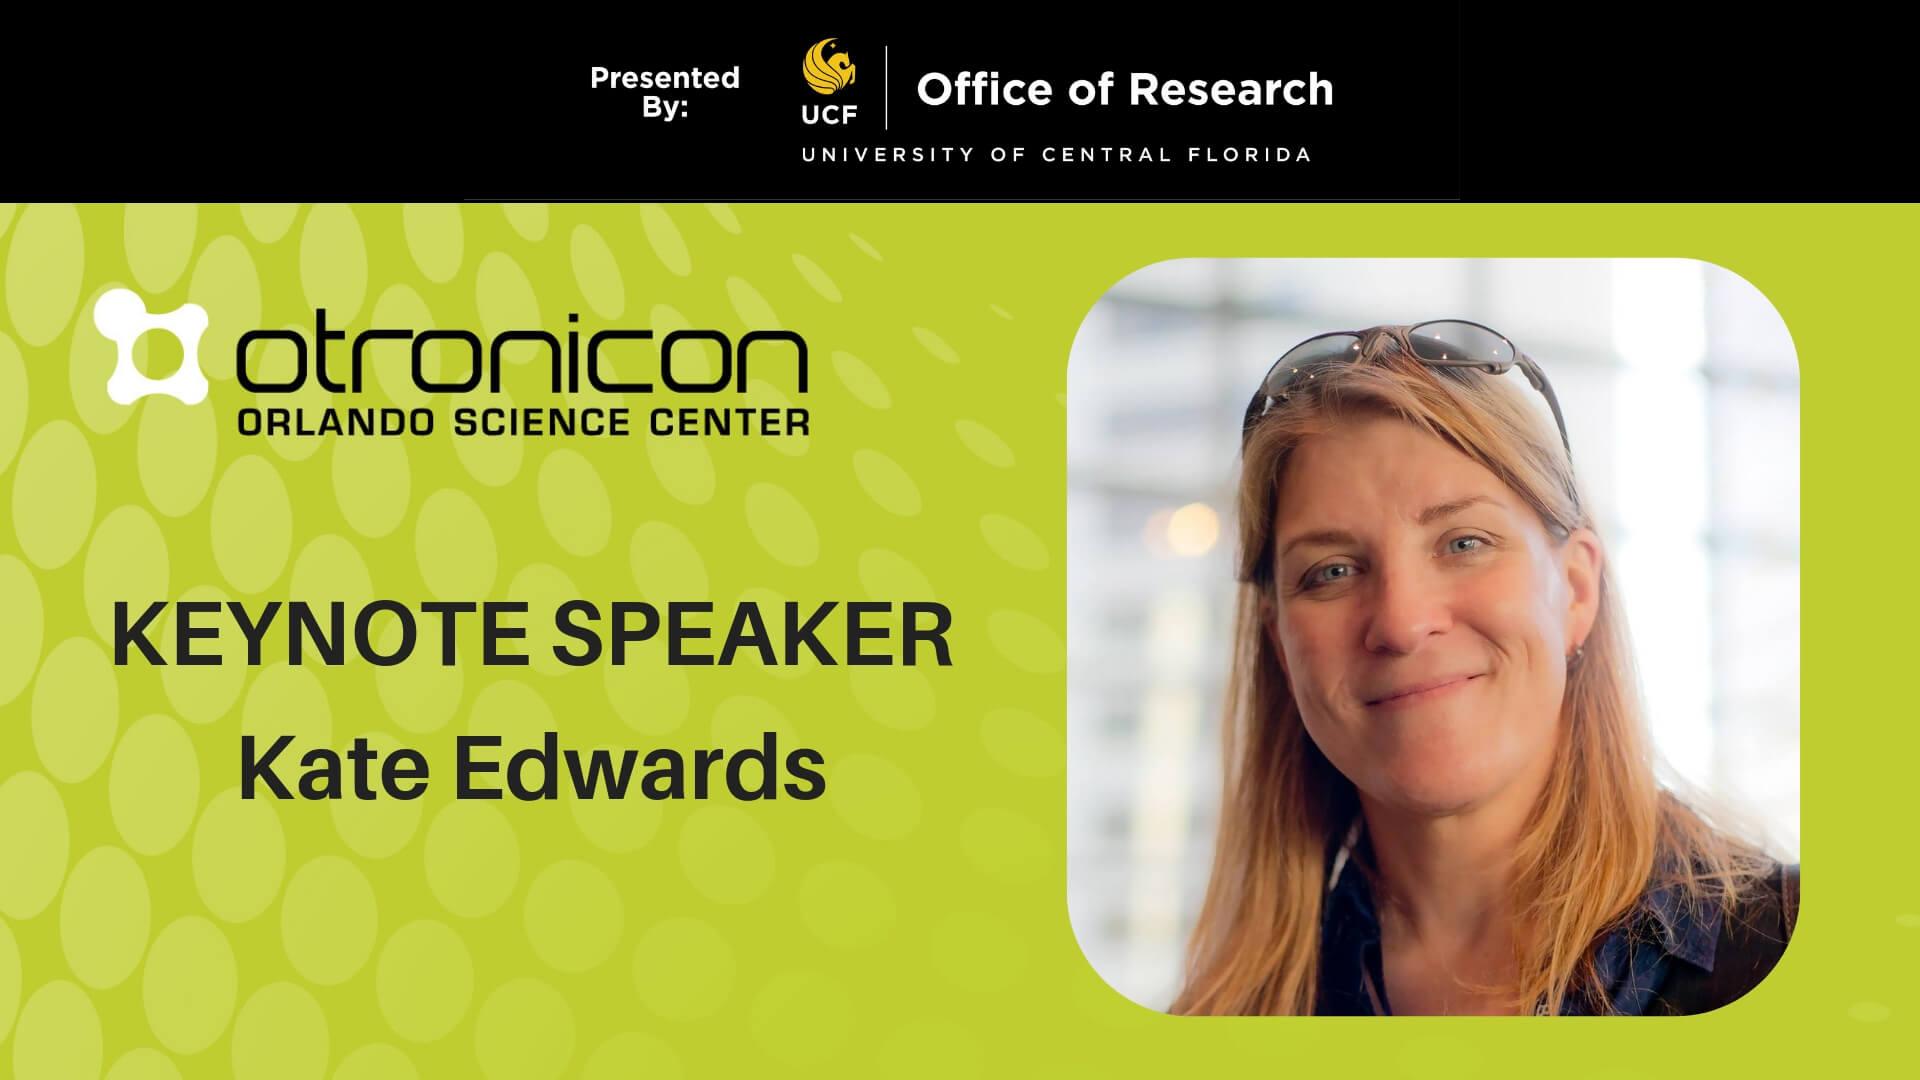 Keynote speaker for otronicon, Kate Edwards